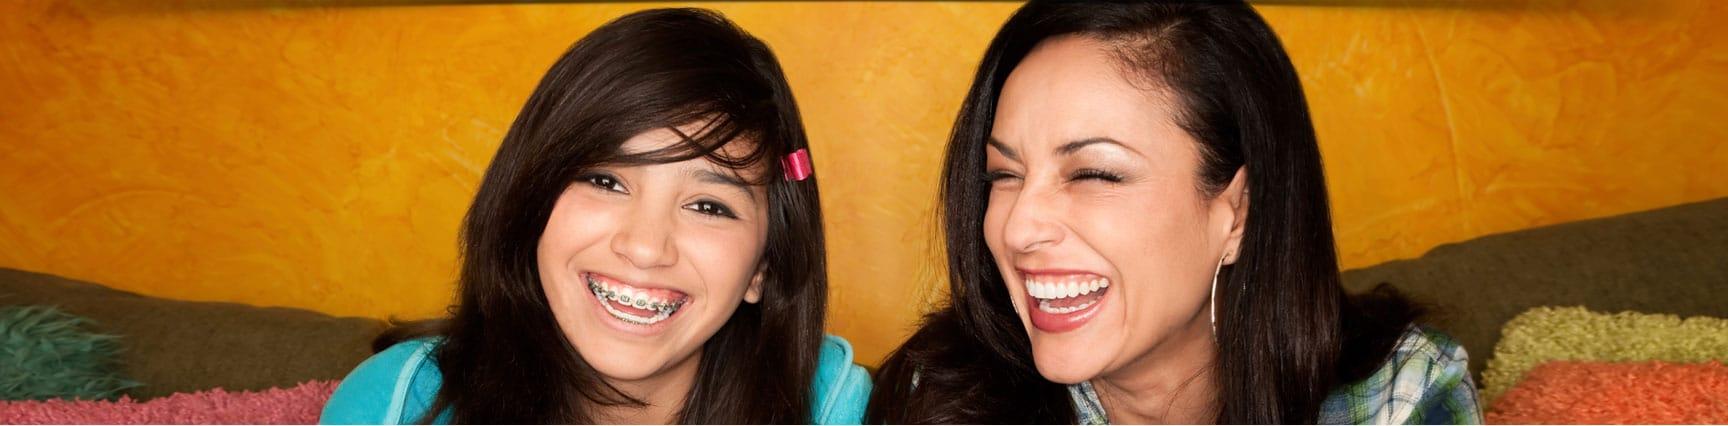 Orthodontics-of-San-Mateo-Dr-Krista-Hirasuna-Dr-Albert-Landucci-Slide-02